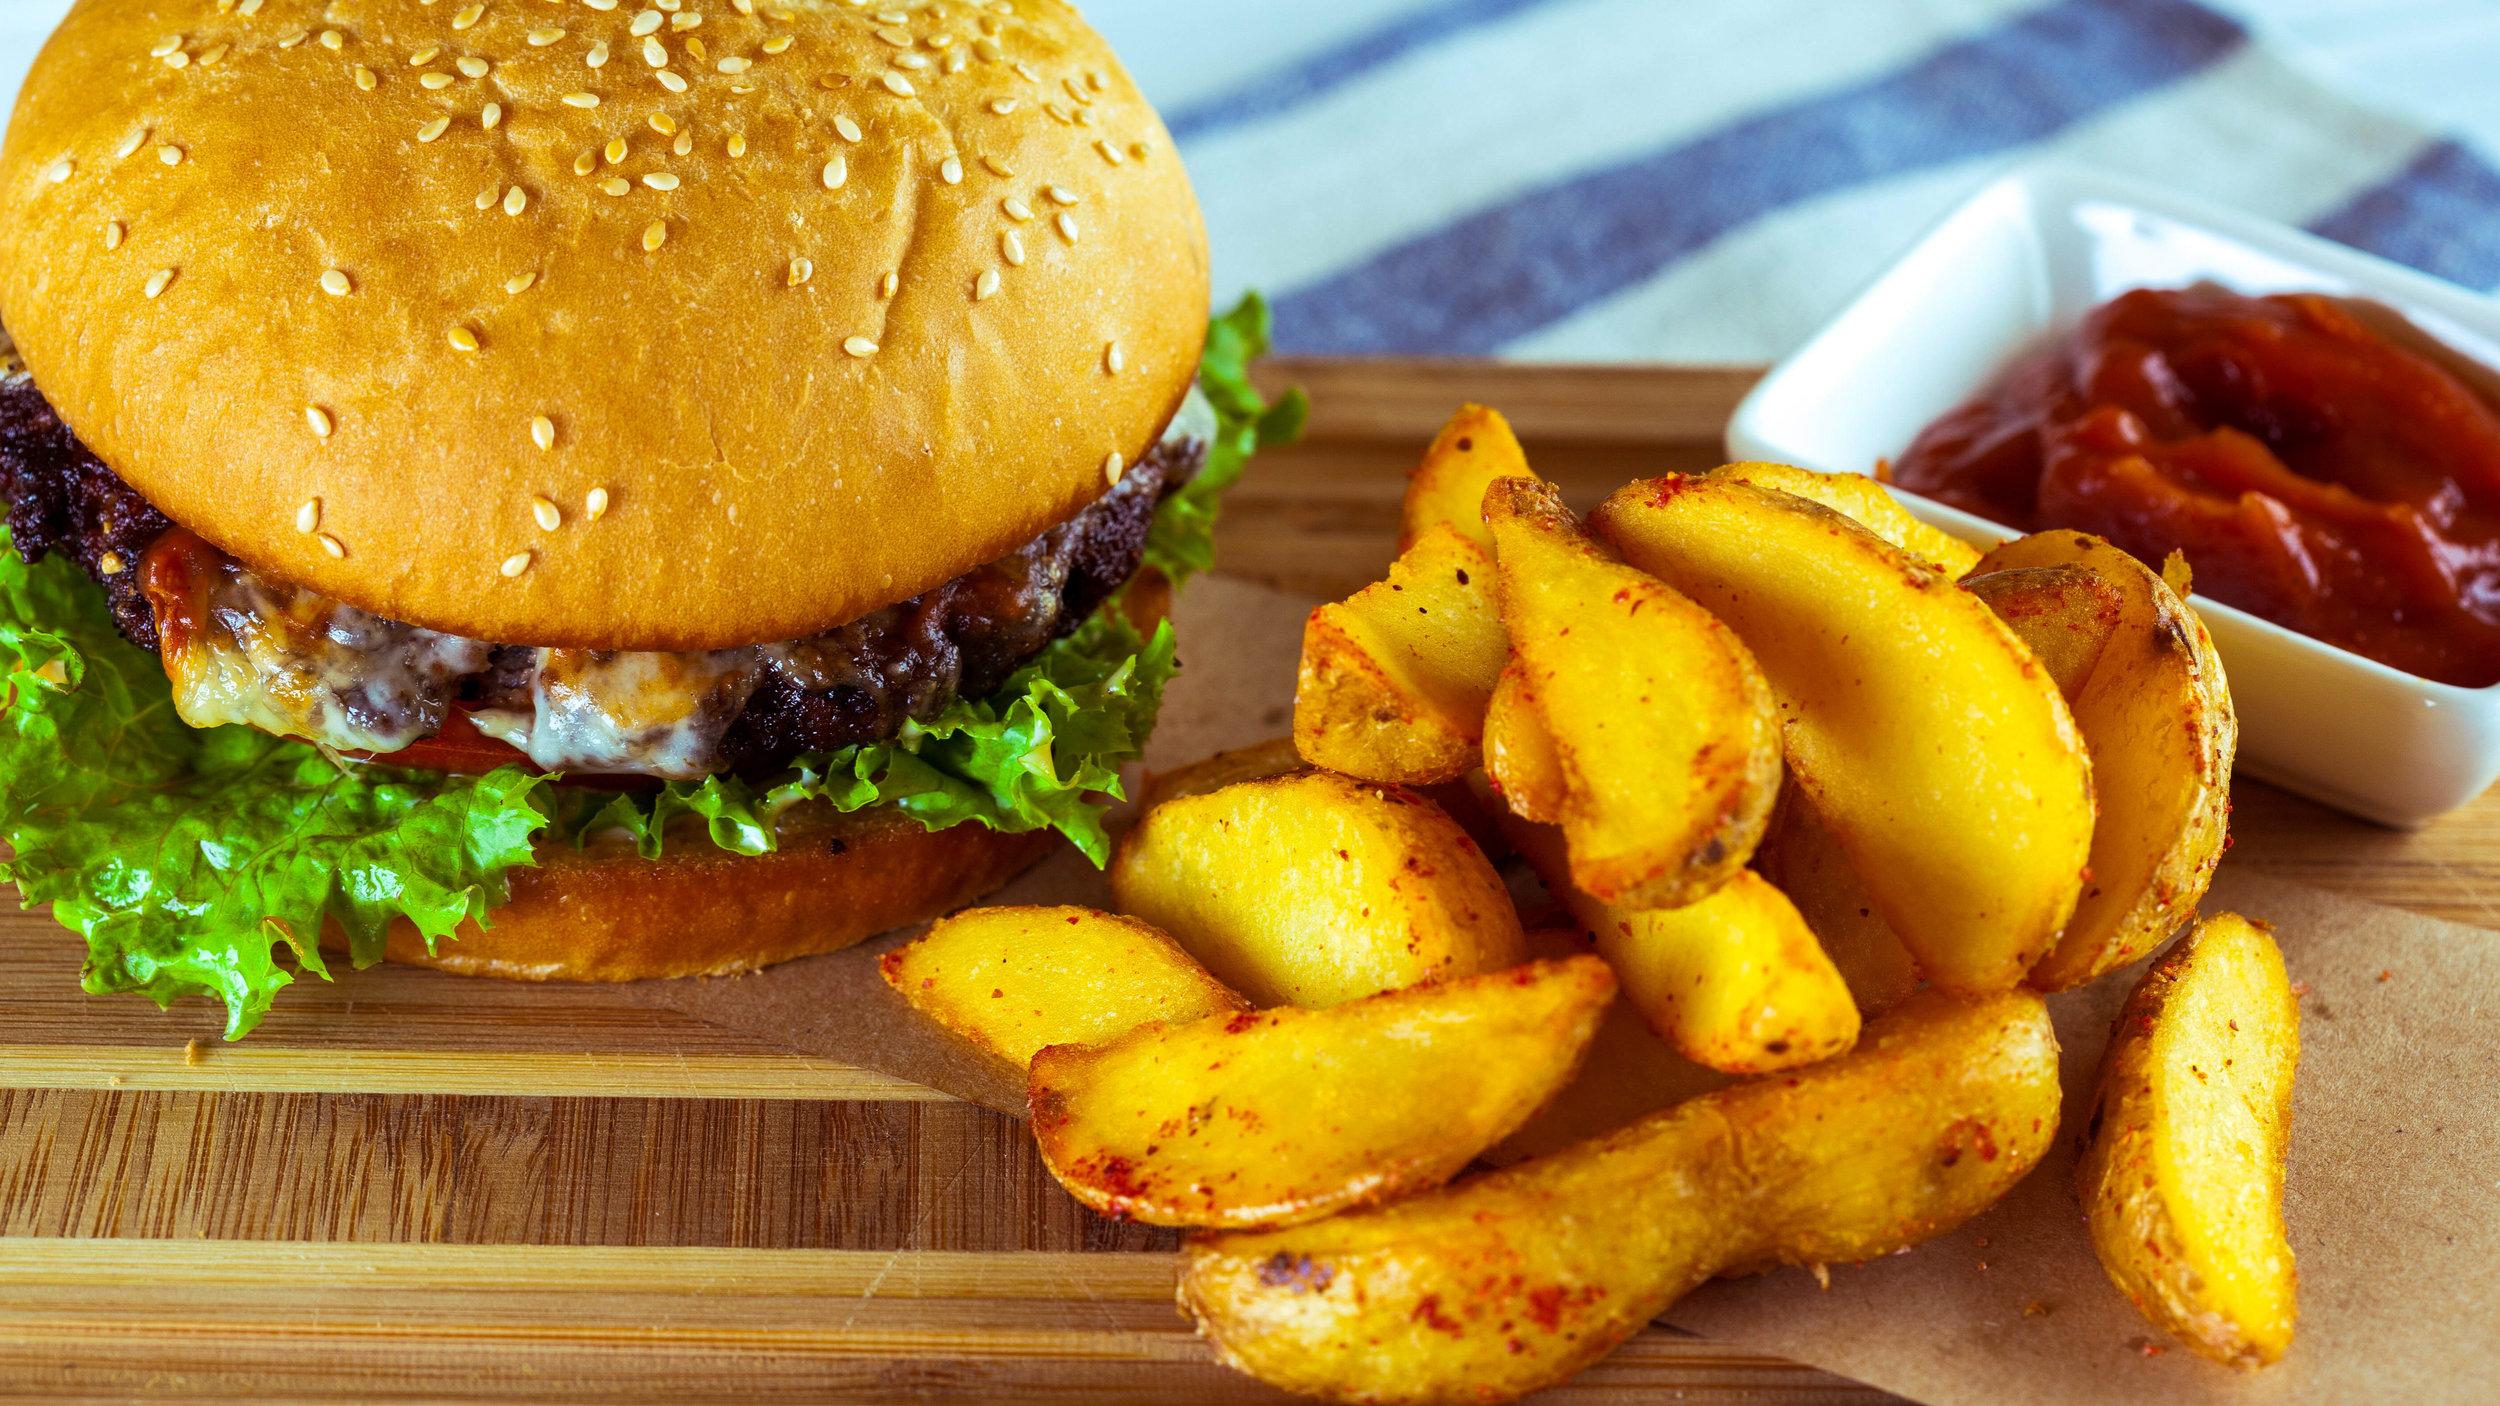 burger-alr-c169-169.jpg